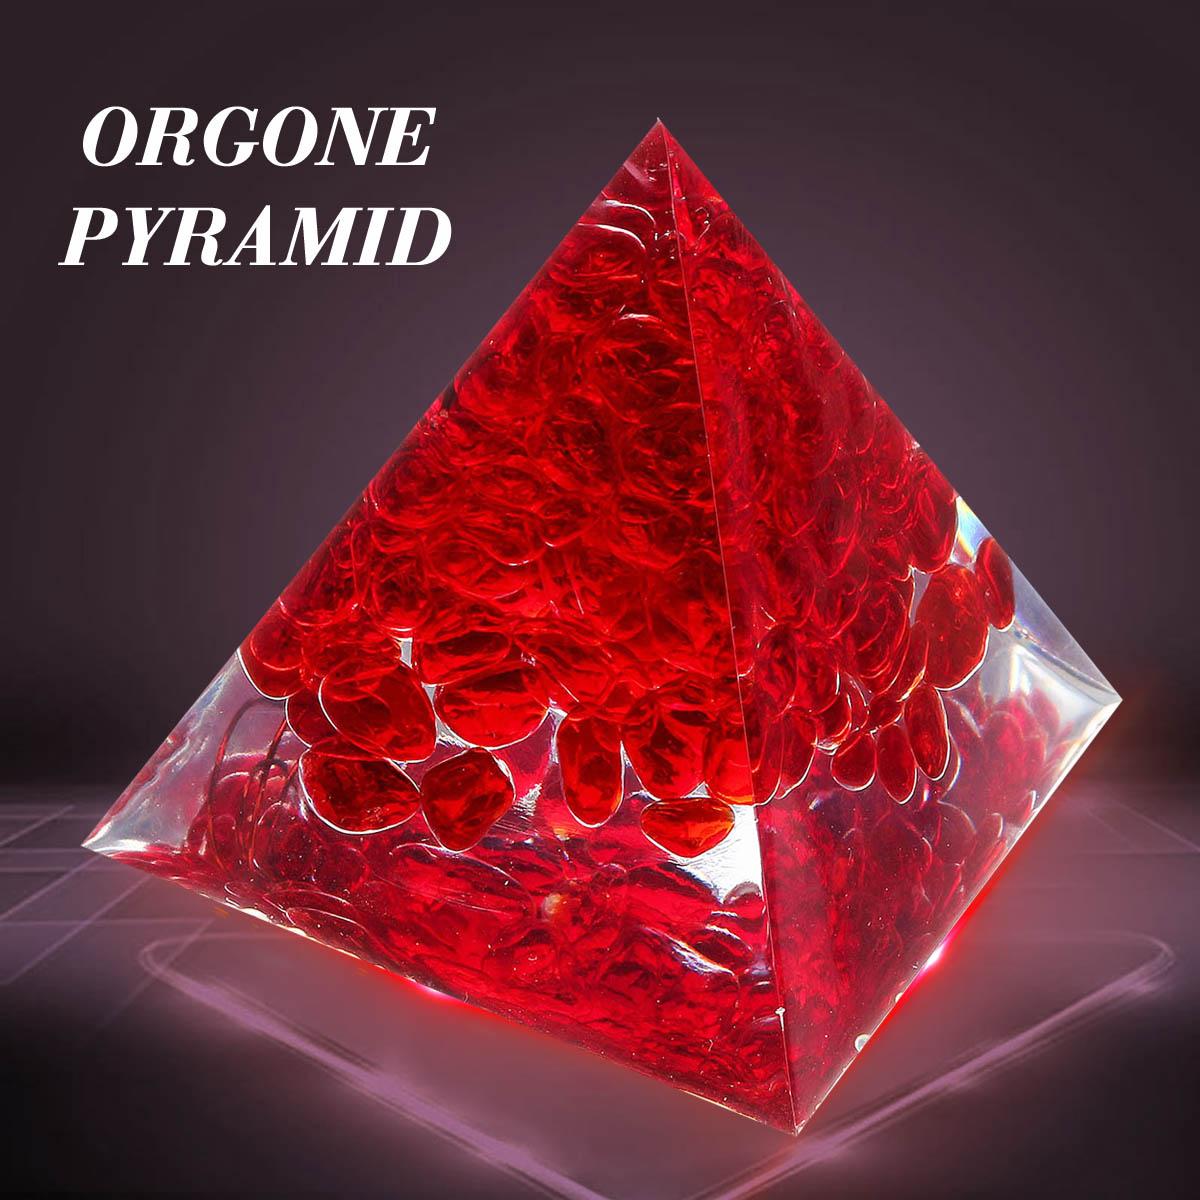 Red Jasper Pyramid Stone Orgorne Natural Gemstone Organit Quartz Crystal Energy Circle Healing Fengshui Home Decor Crafts Gift